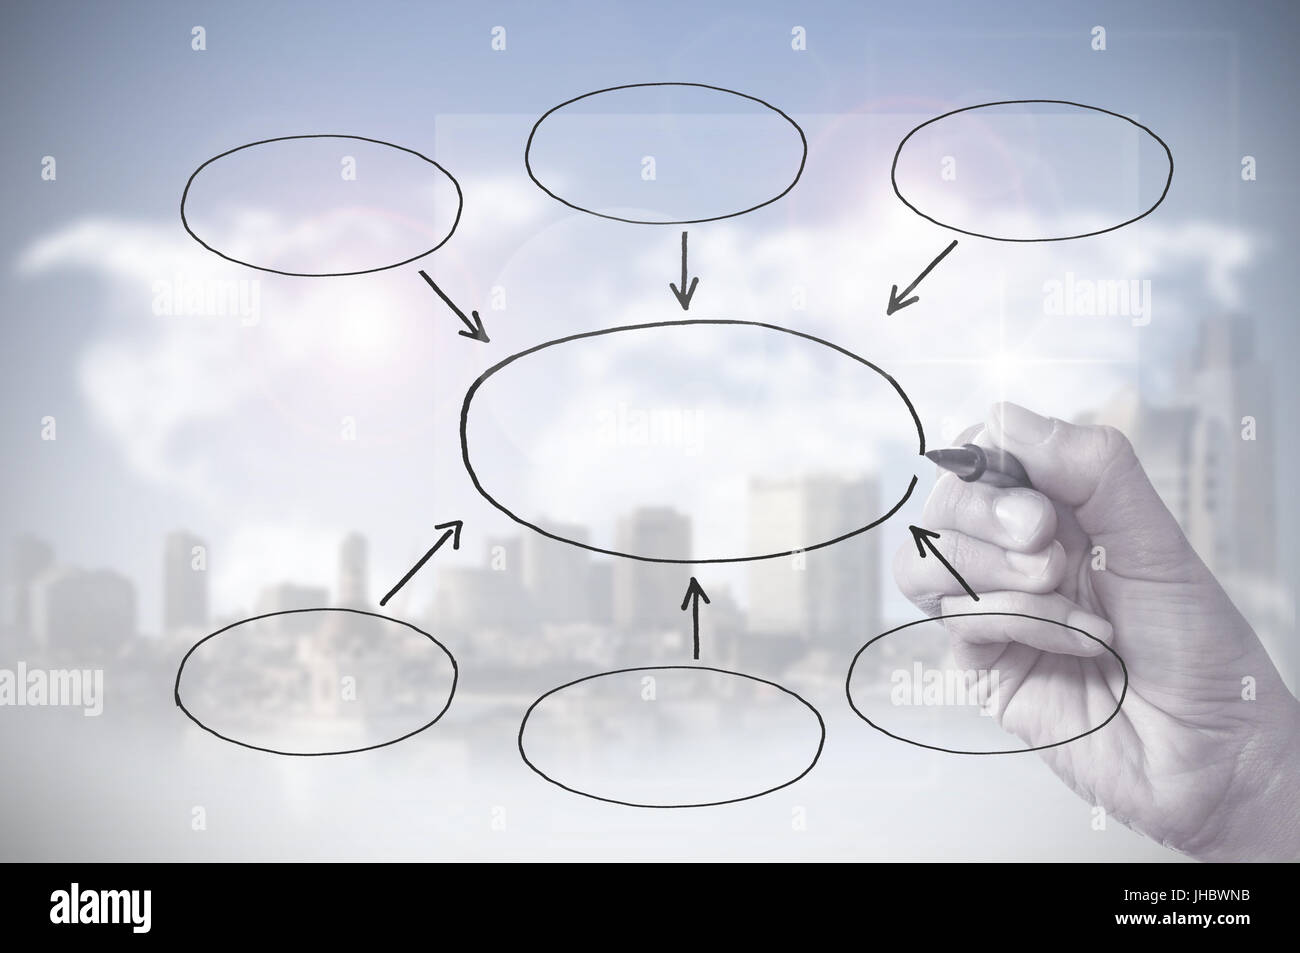 Hand drawing an empty flowchart diagram stock photo royalty free hand drawing an empty flowchart diagram nvjuhfo Gallery